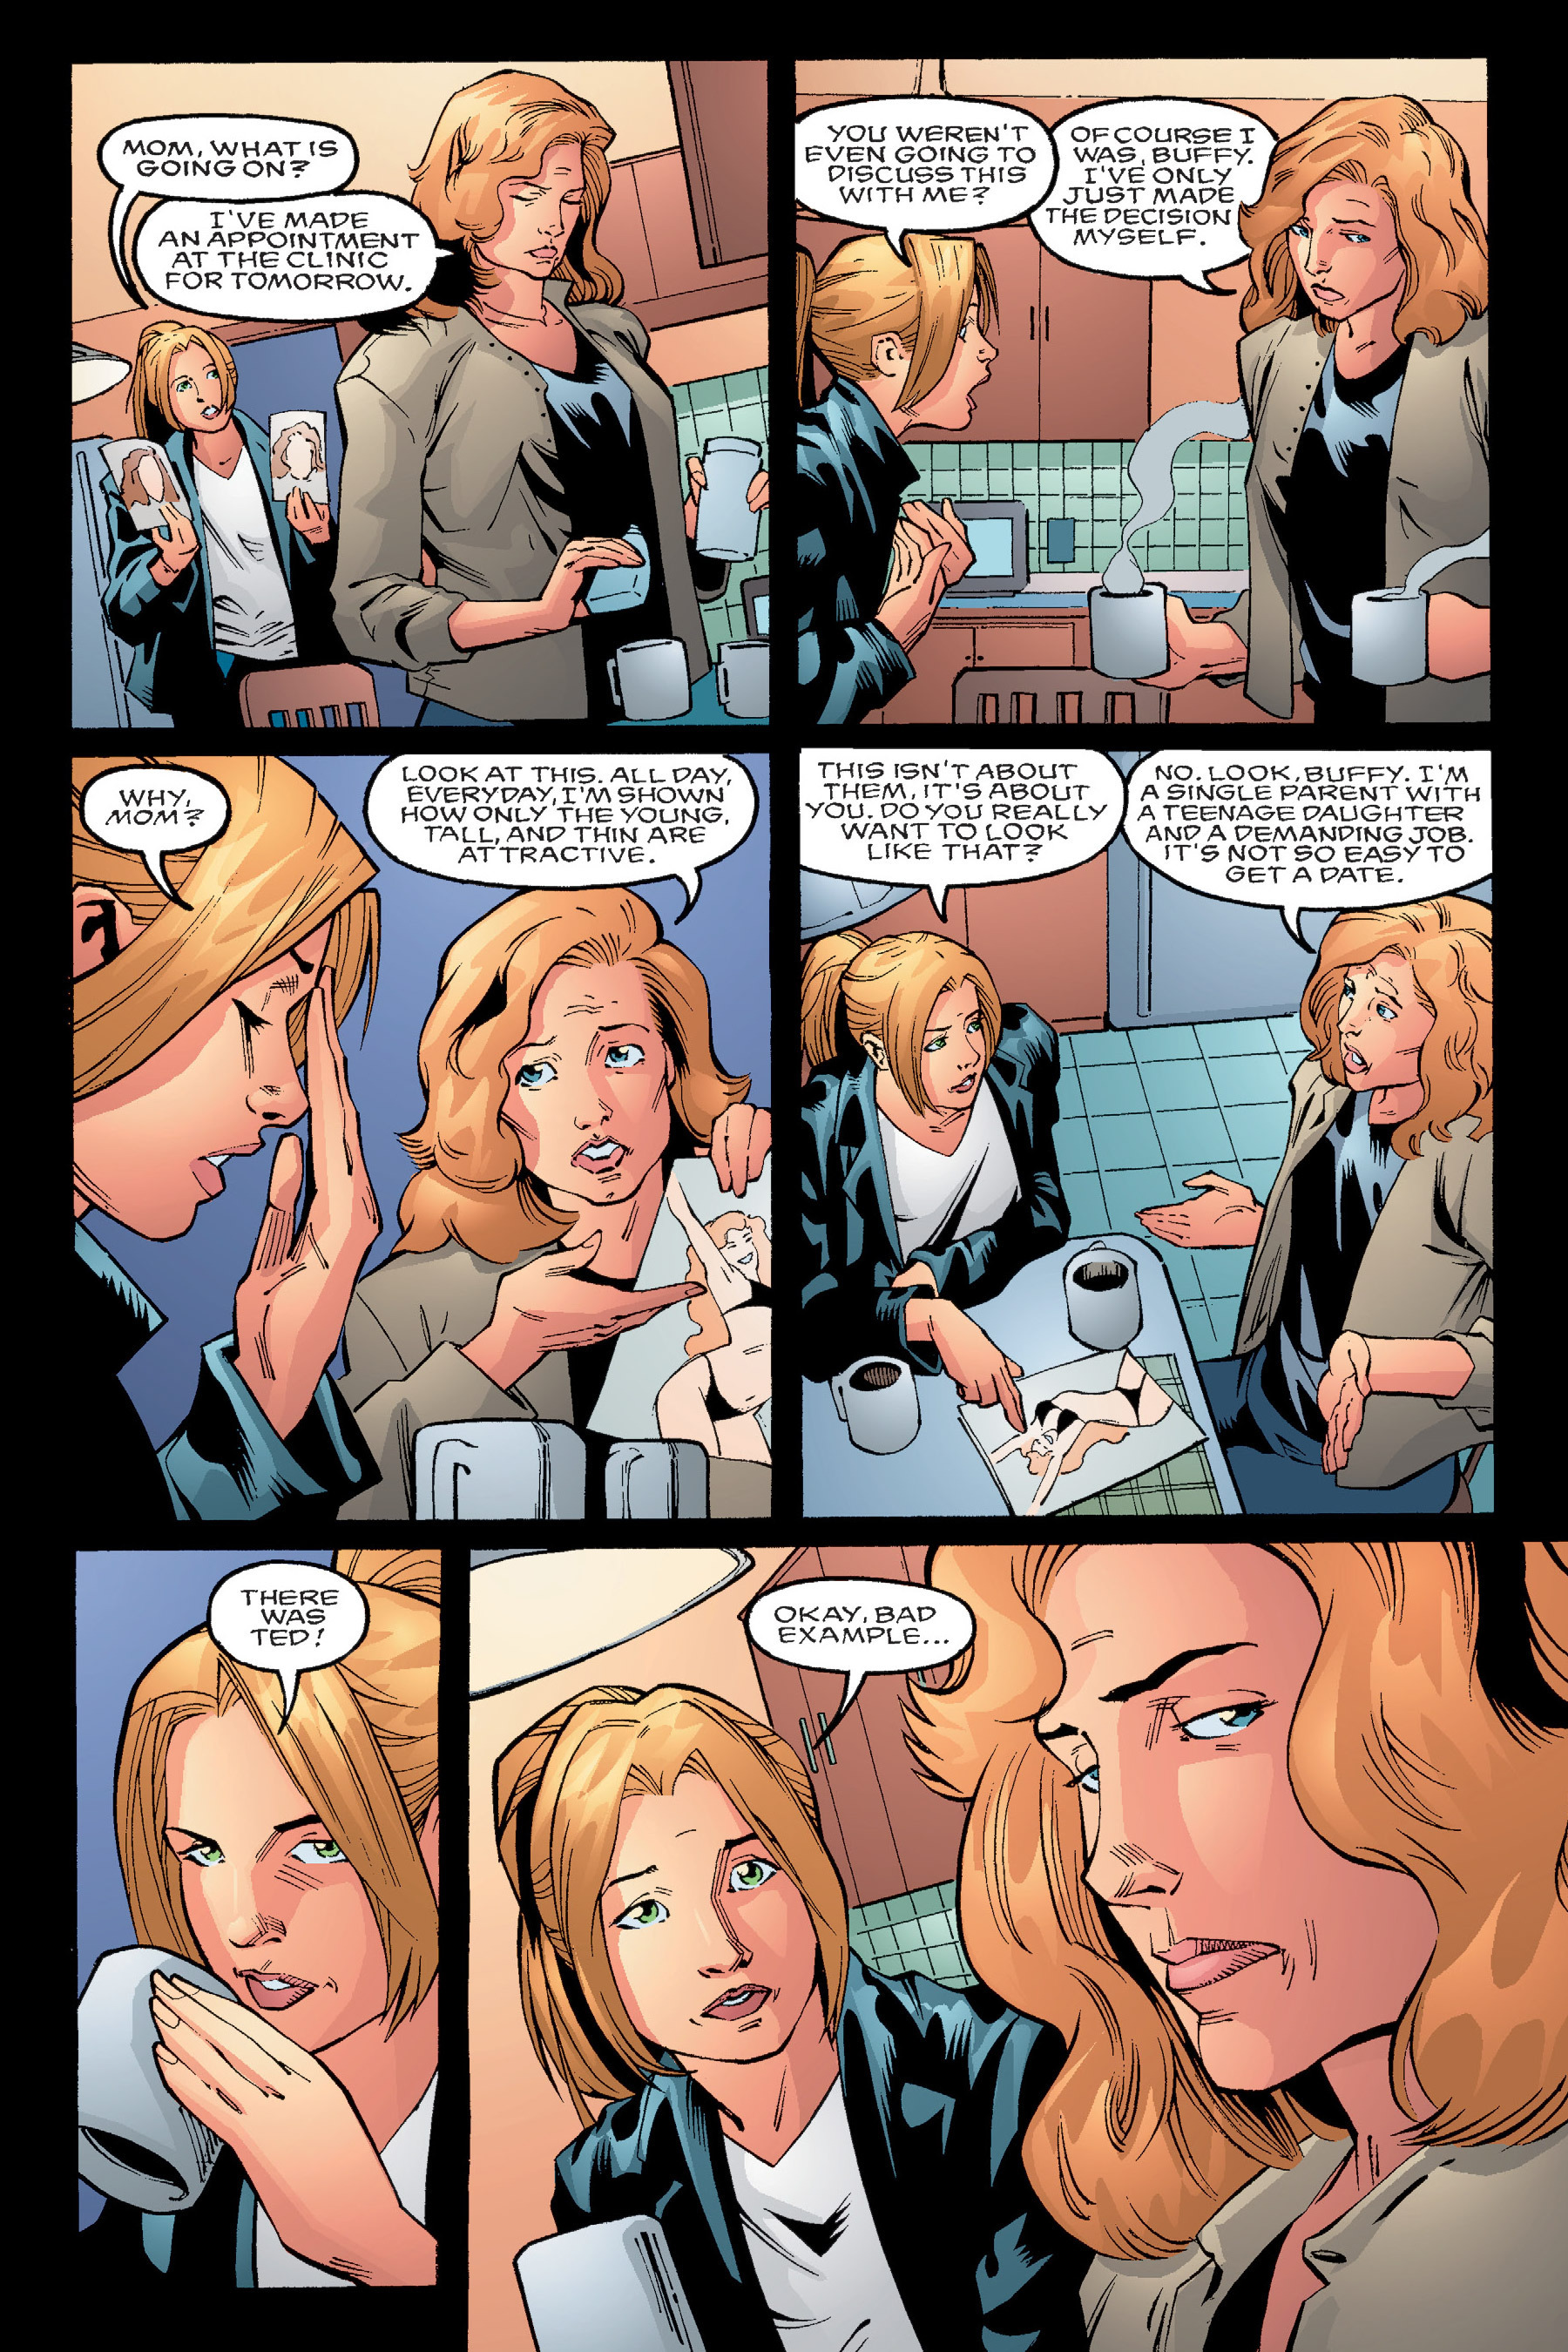 Read online Buffy the Vampire Slayer: Omnibus comic -  Issue # TPB 4 - 26